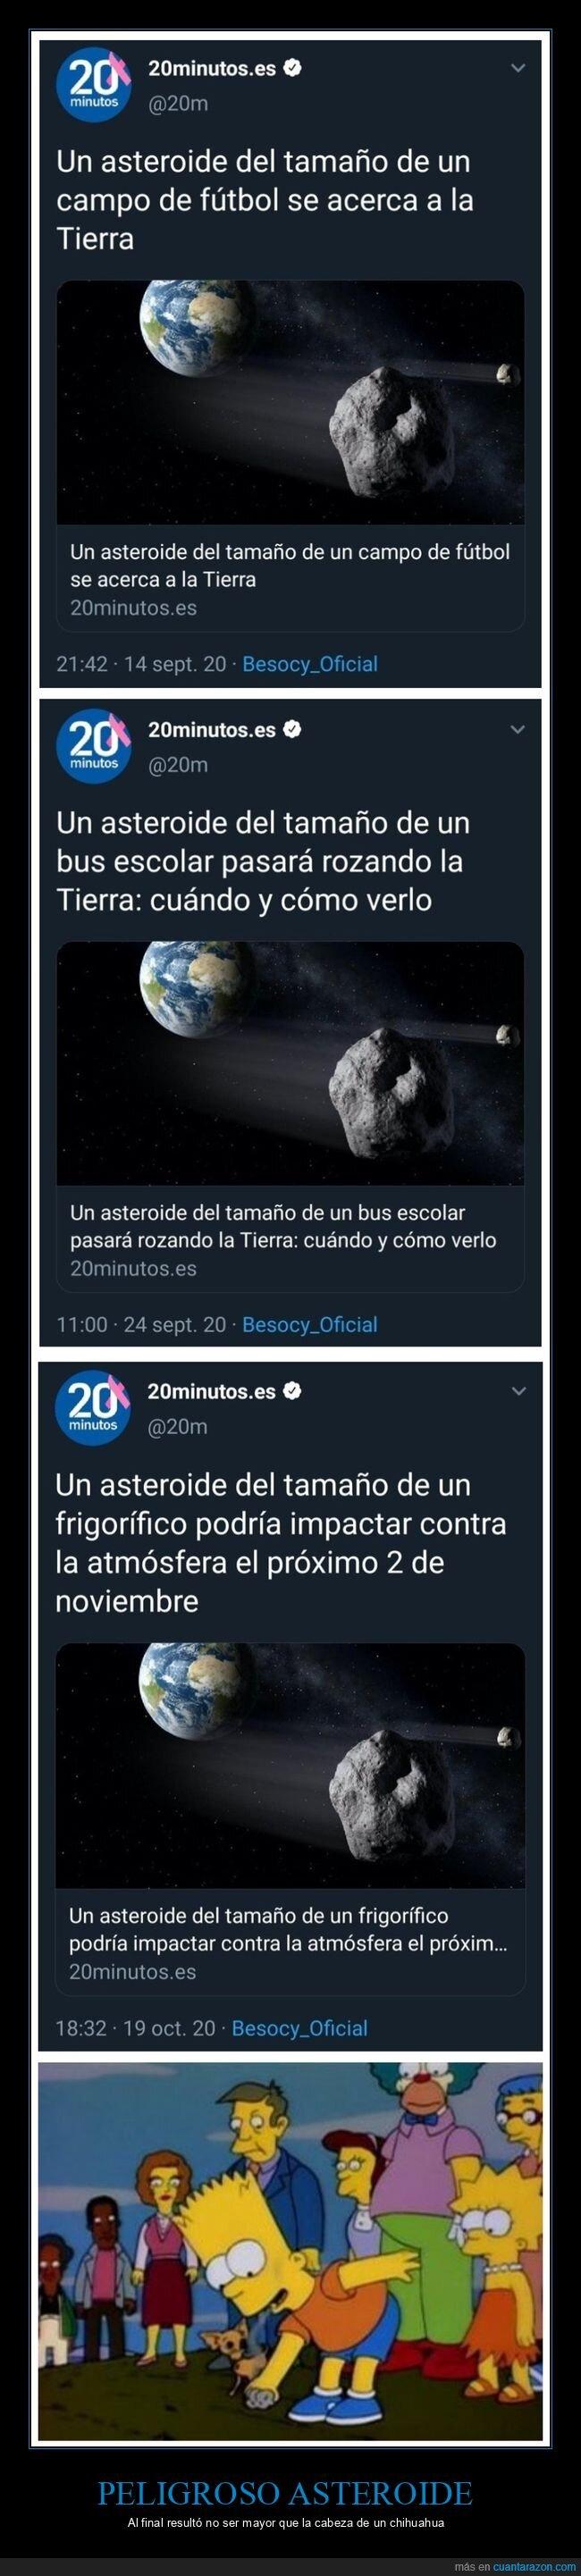 asteroide,tamaño,wtf